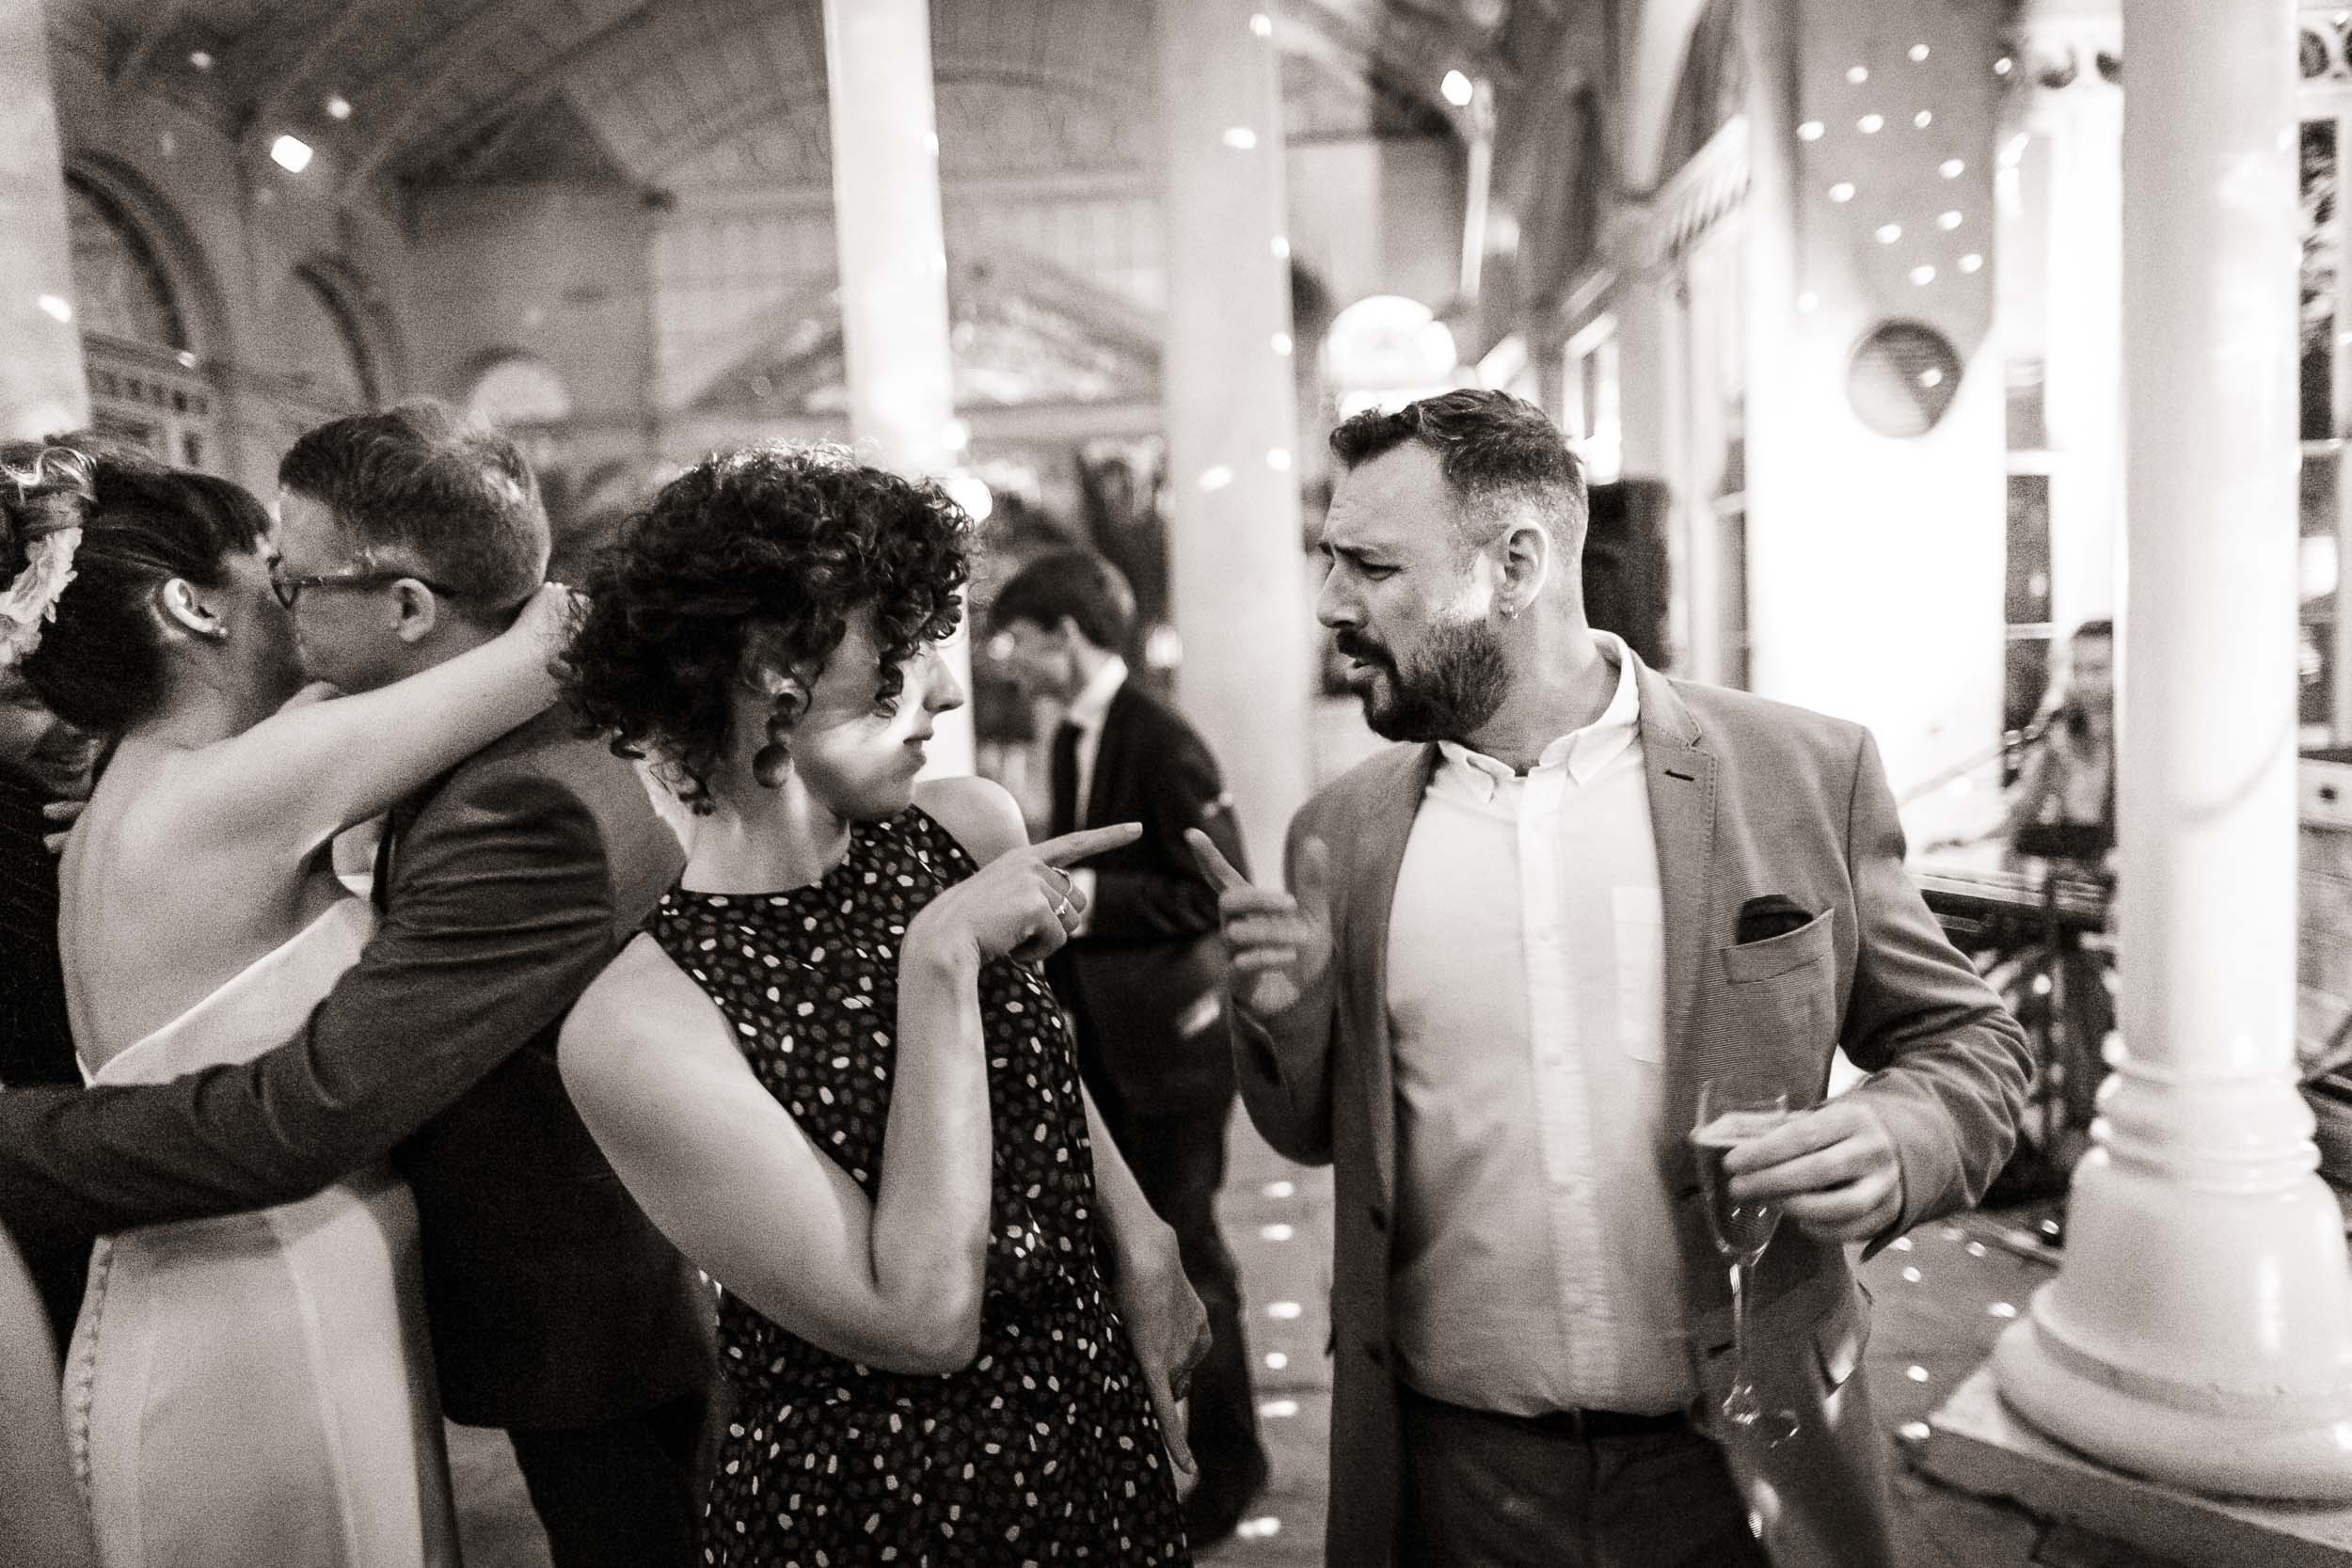 syon-house-wedding-photographer-london 168.jpg